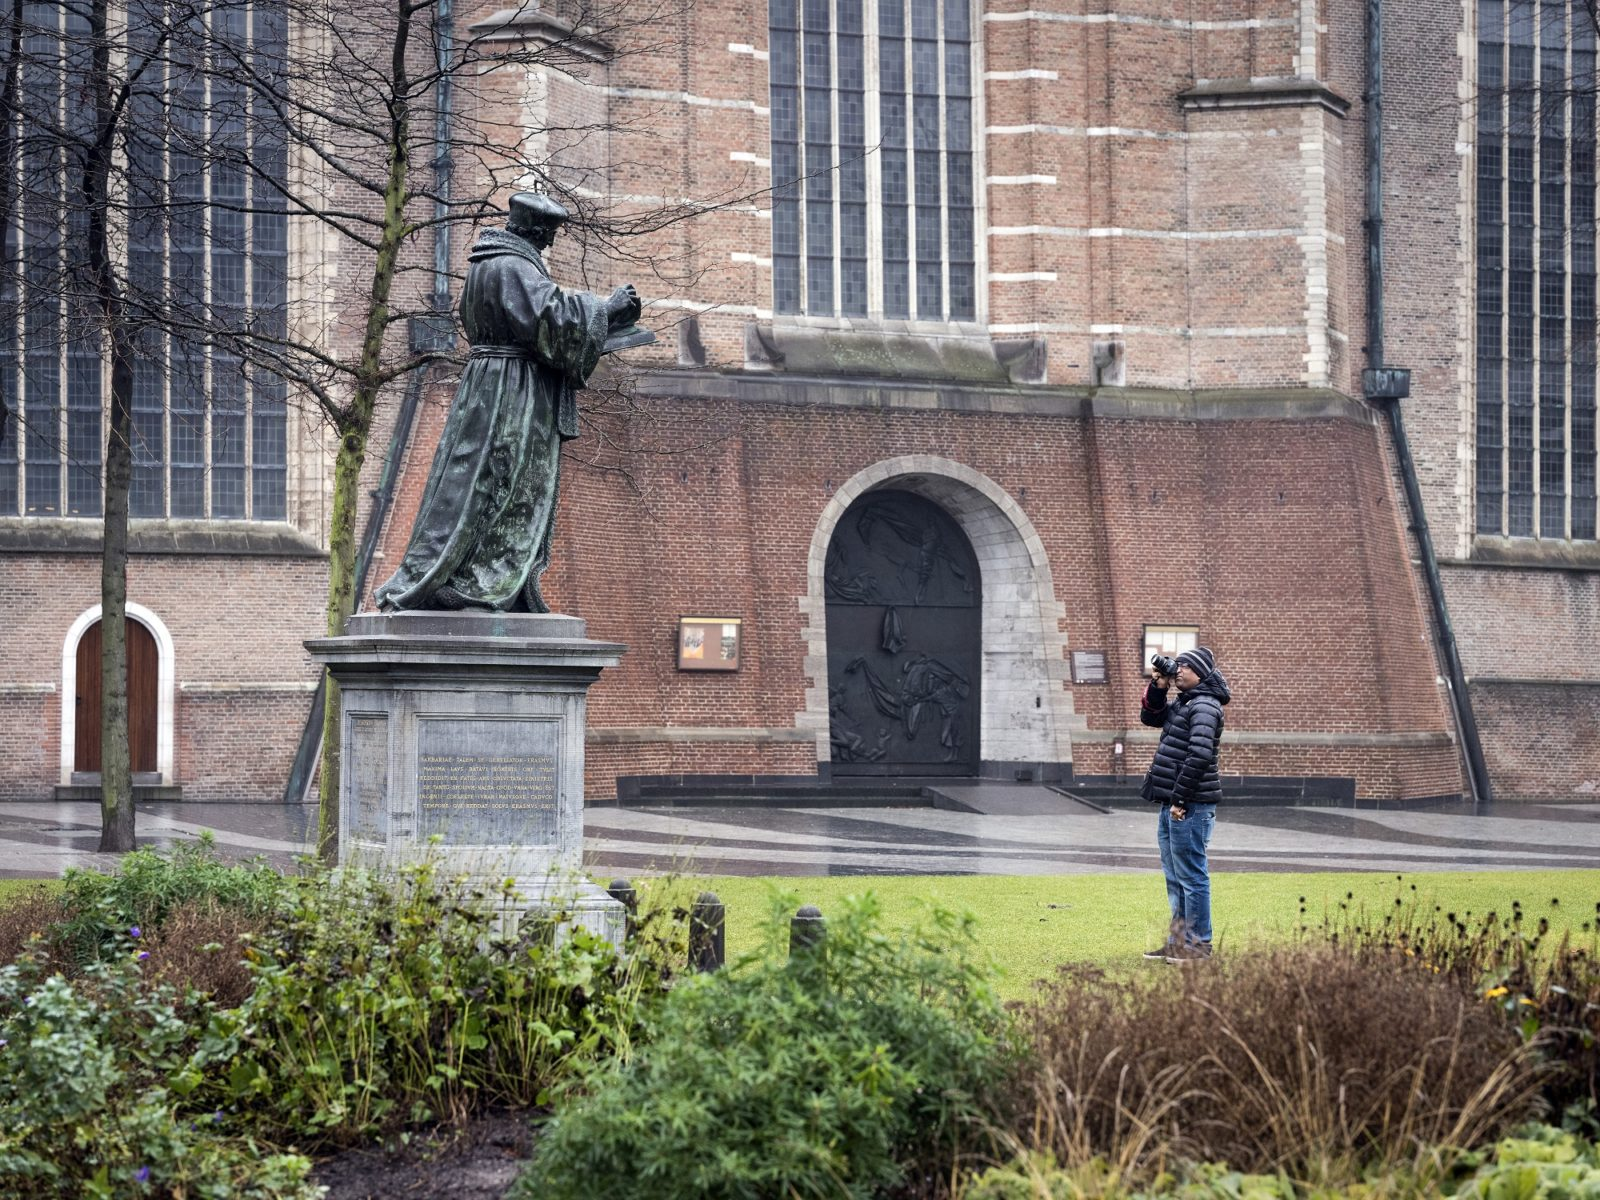 Erasmusbeeld-Rotterdam-1117-0092